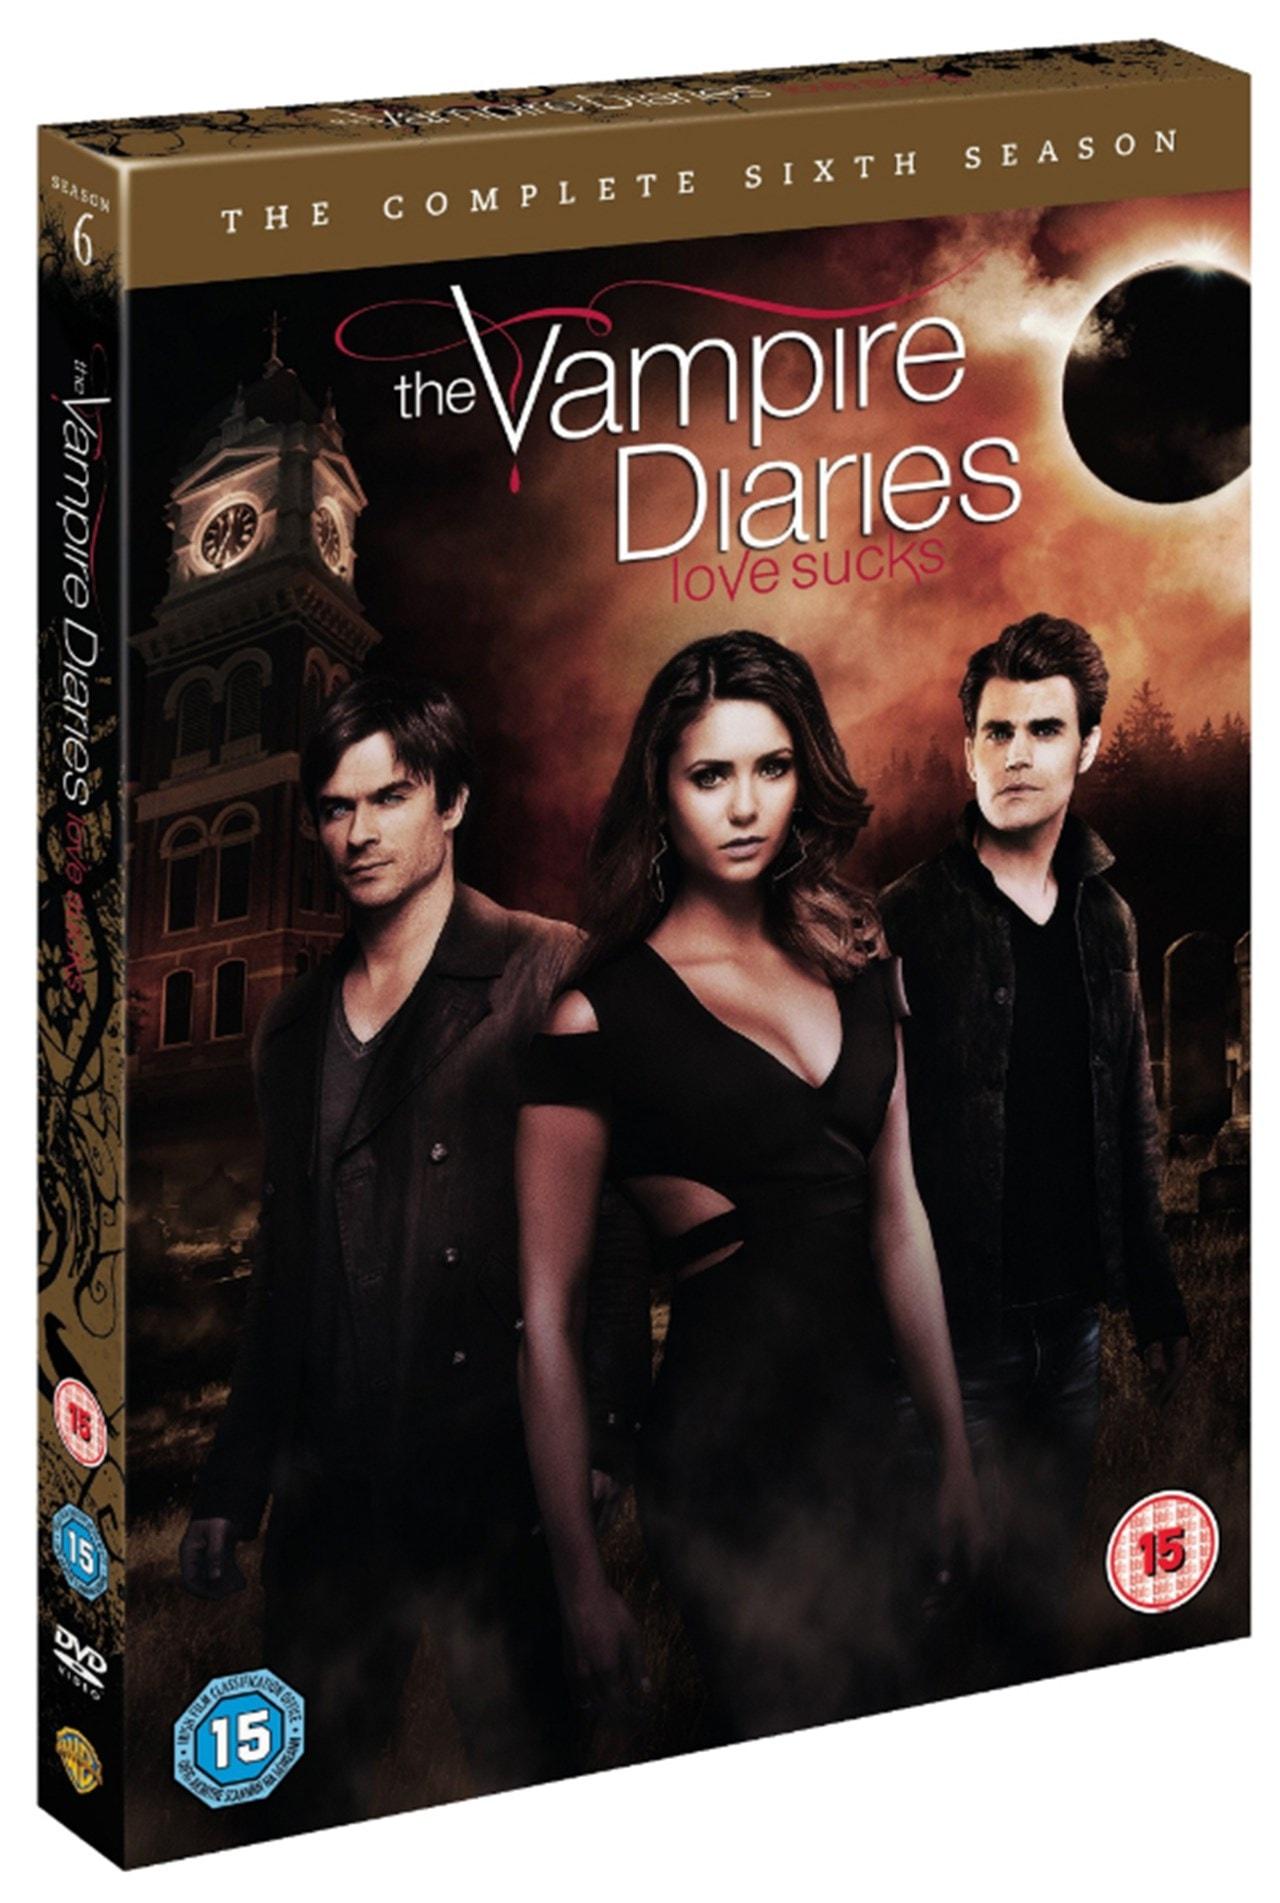 The Vampire Diaries: The Complete Sixth Season - 2